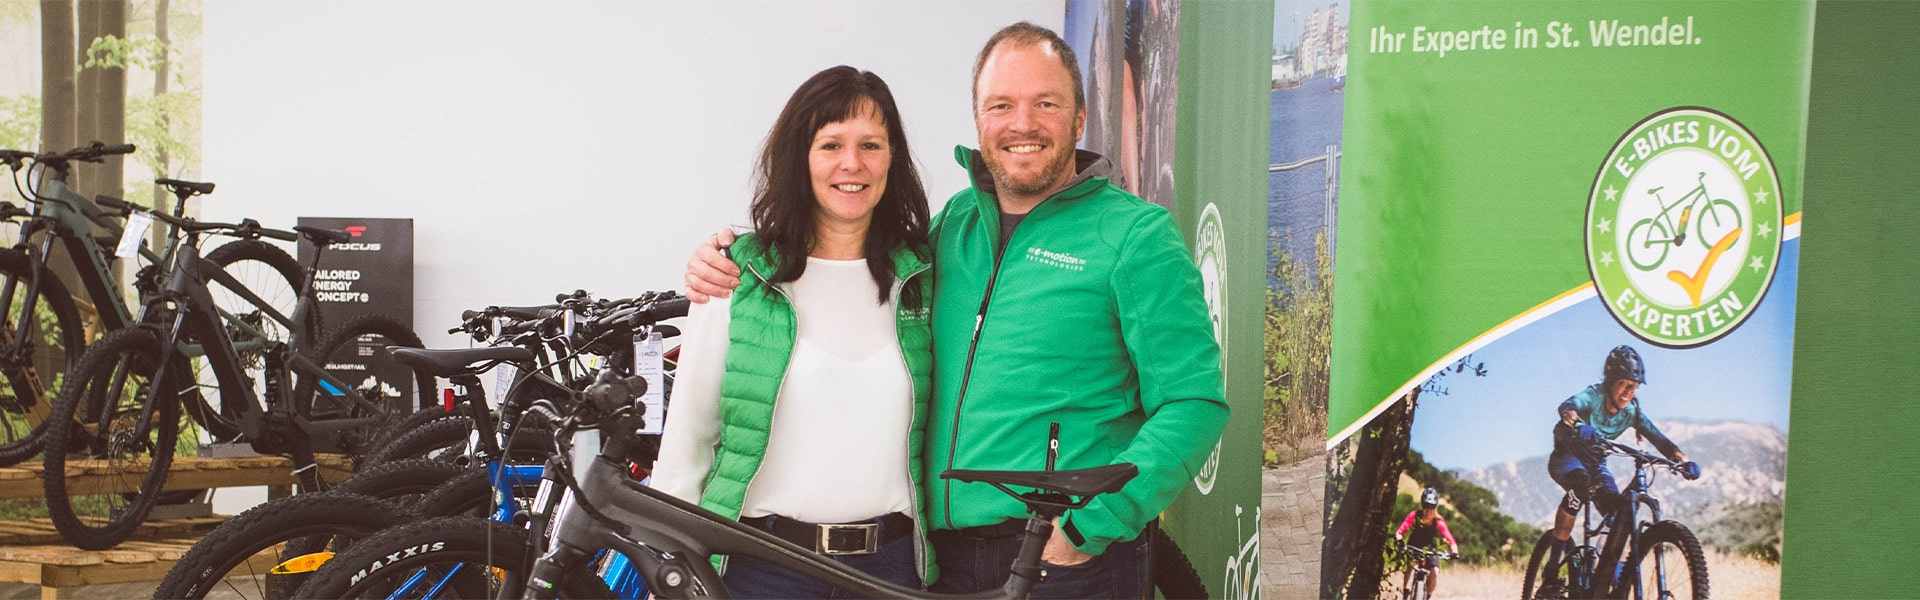 Das Team der e-motion e-Bike Welt Sankt Wendel